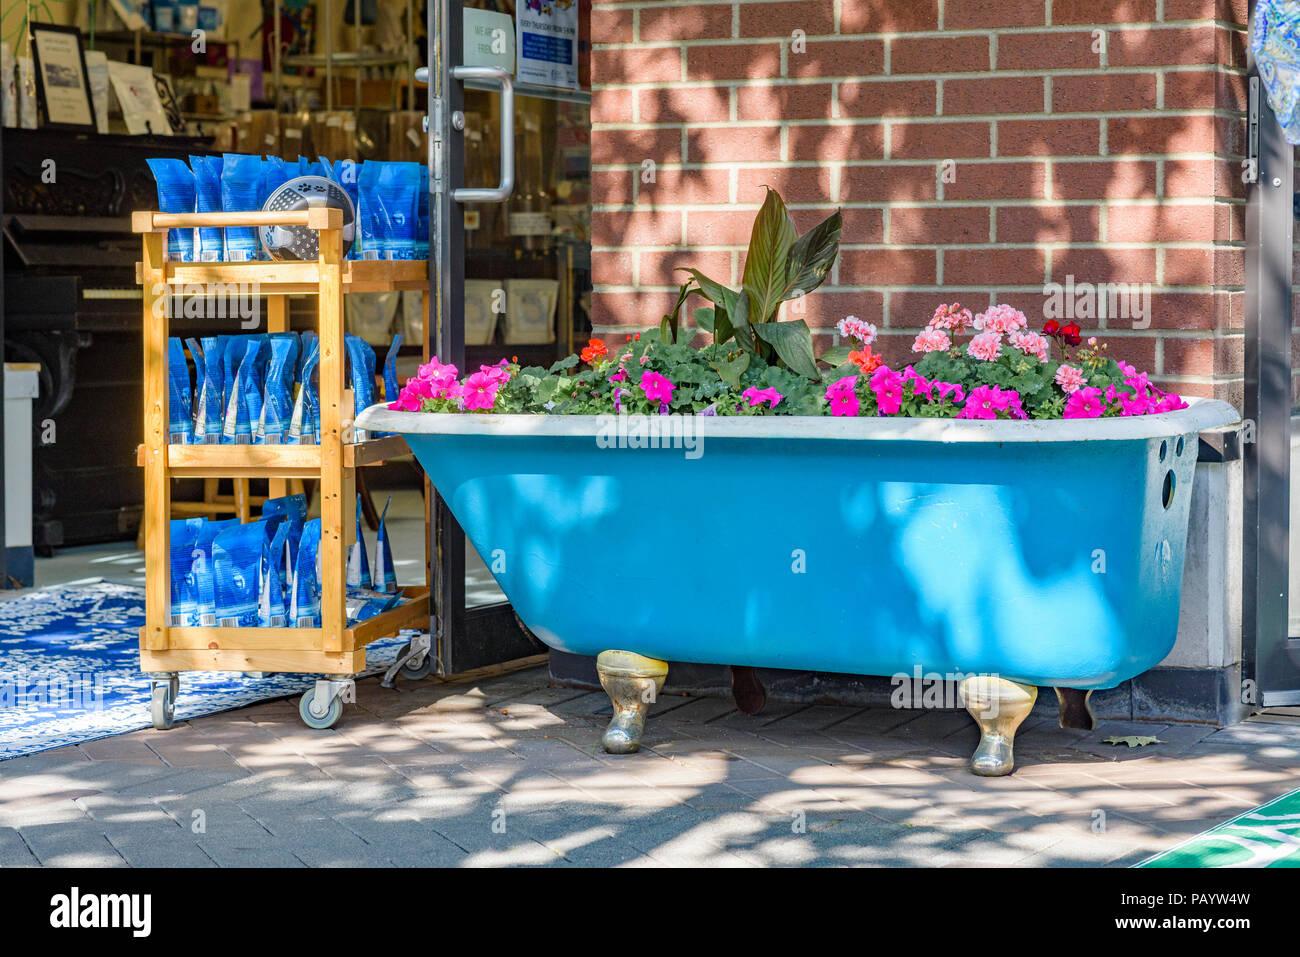 Bathtub Flowers Stock Photos & Bathtub Flowers Stock Images - Alamy